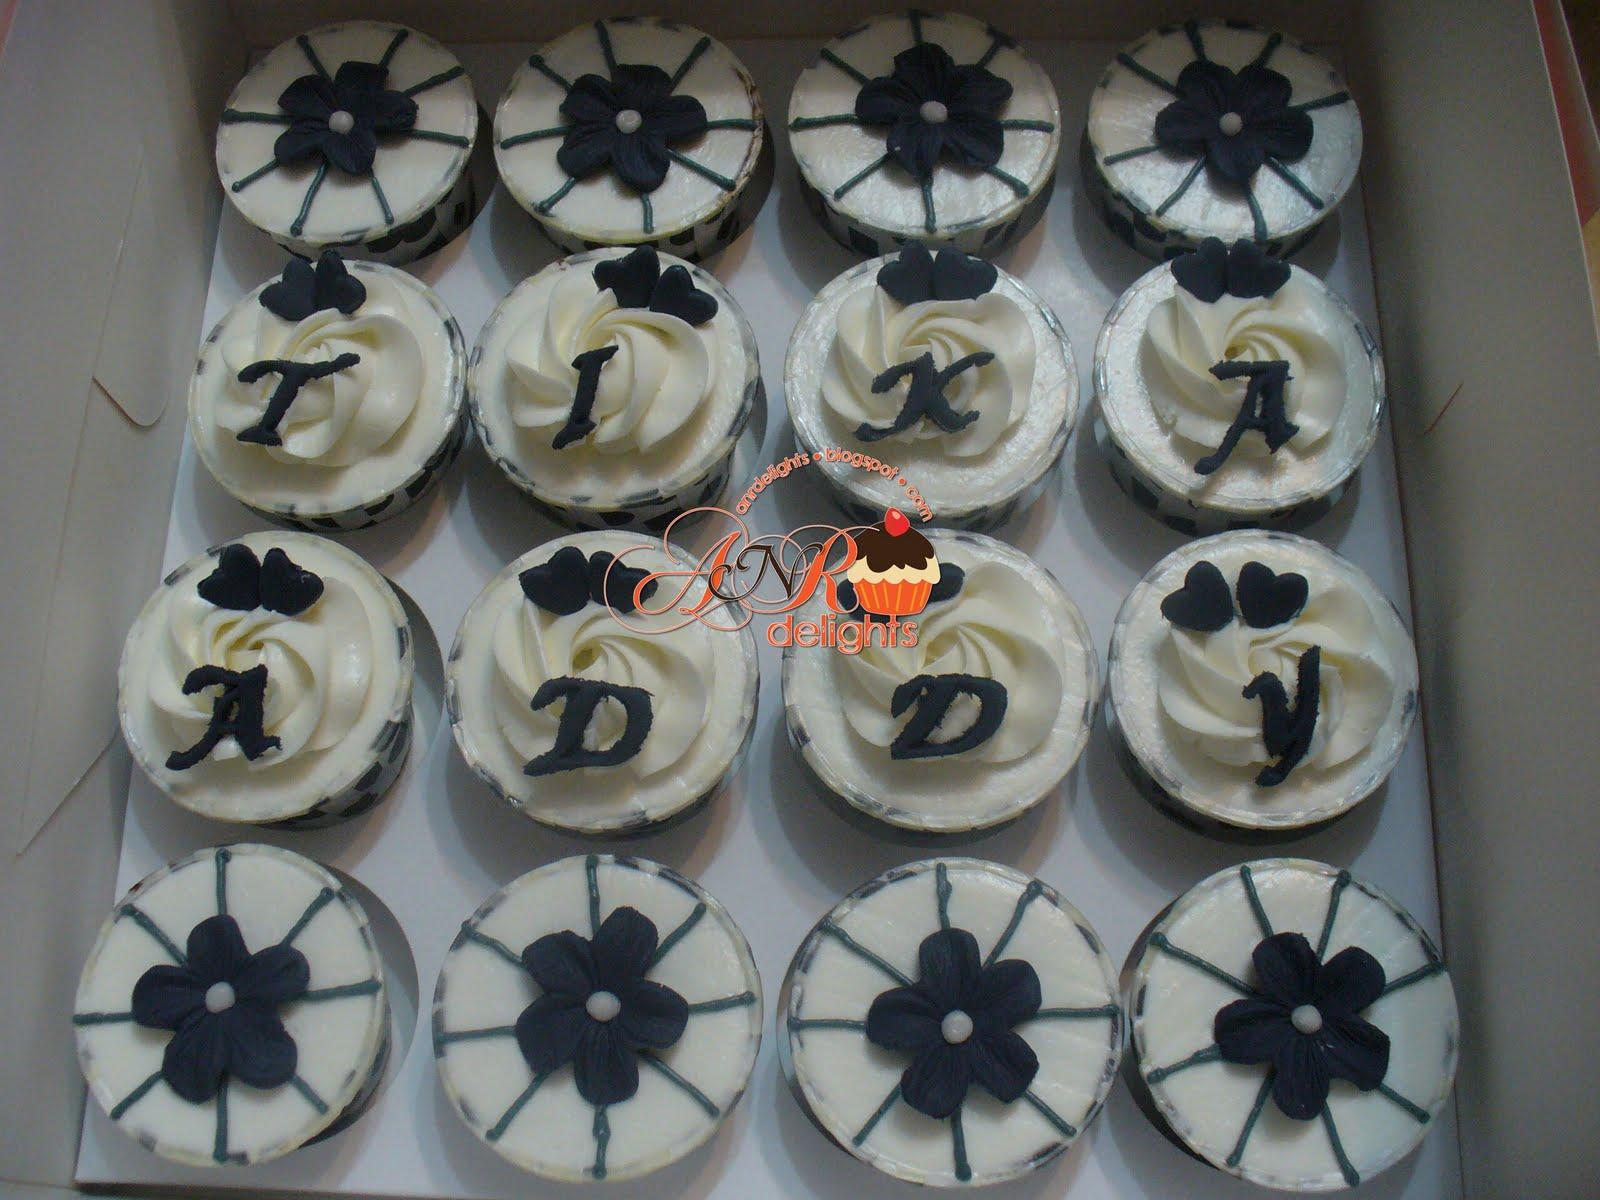 dengan wedding cakes.